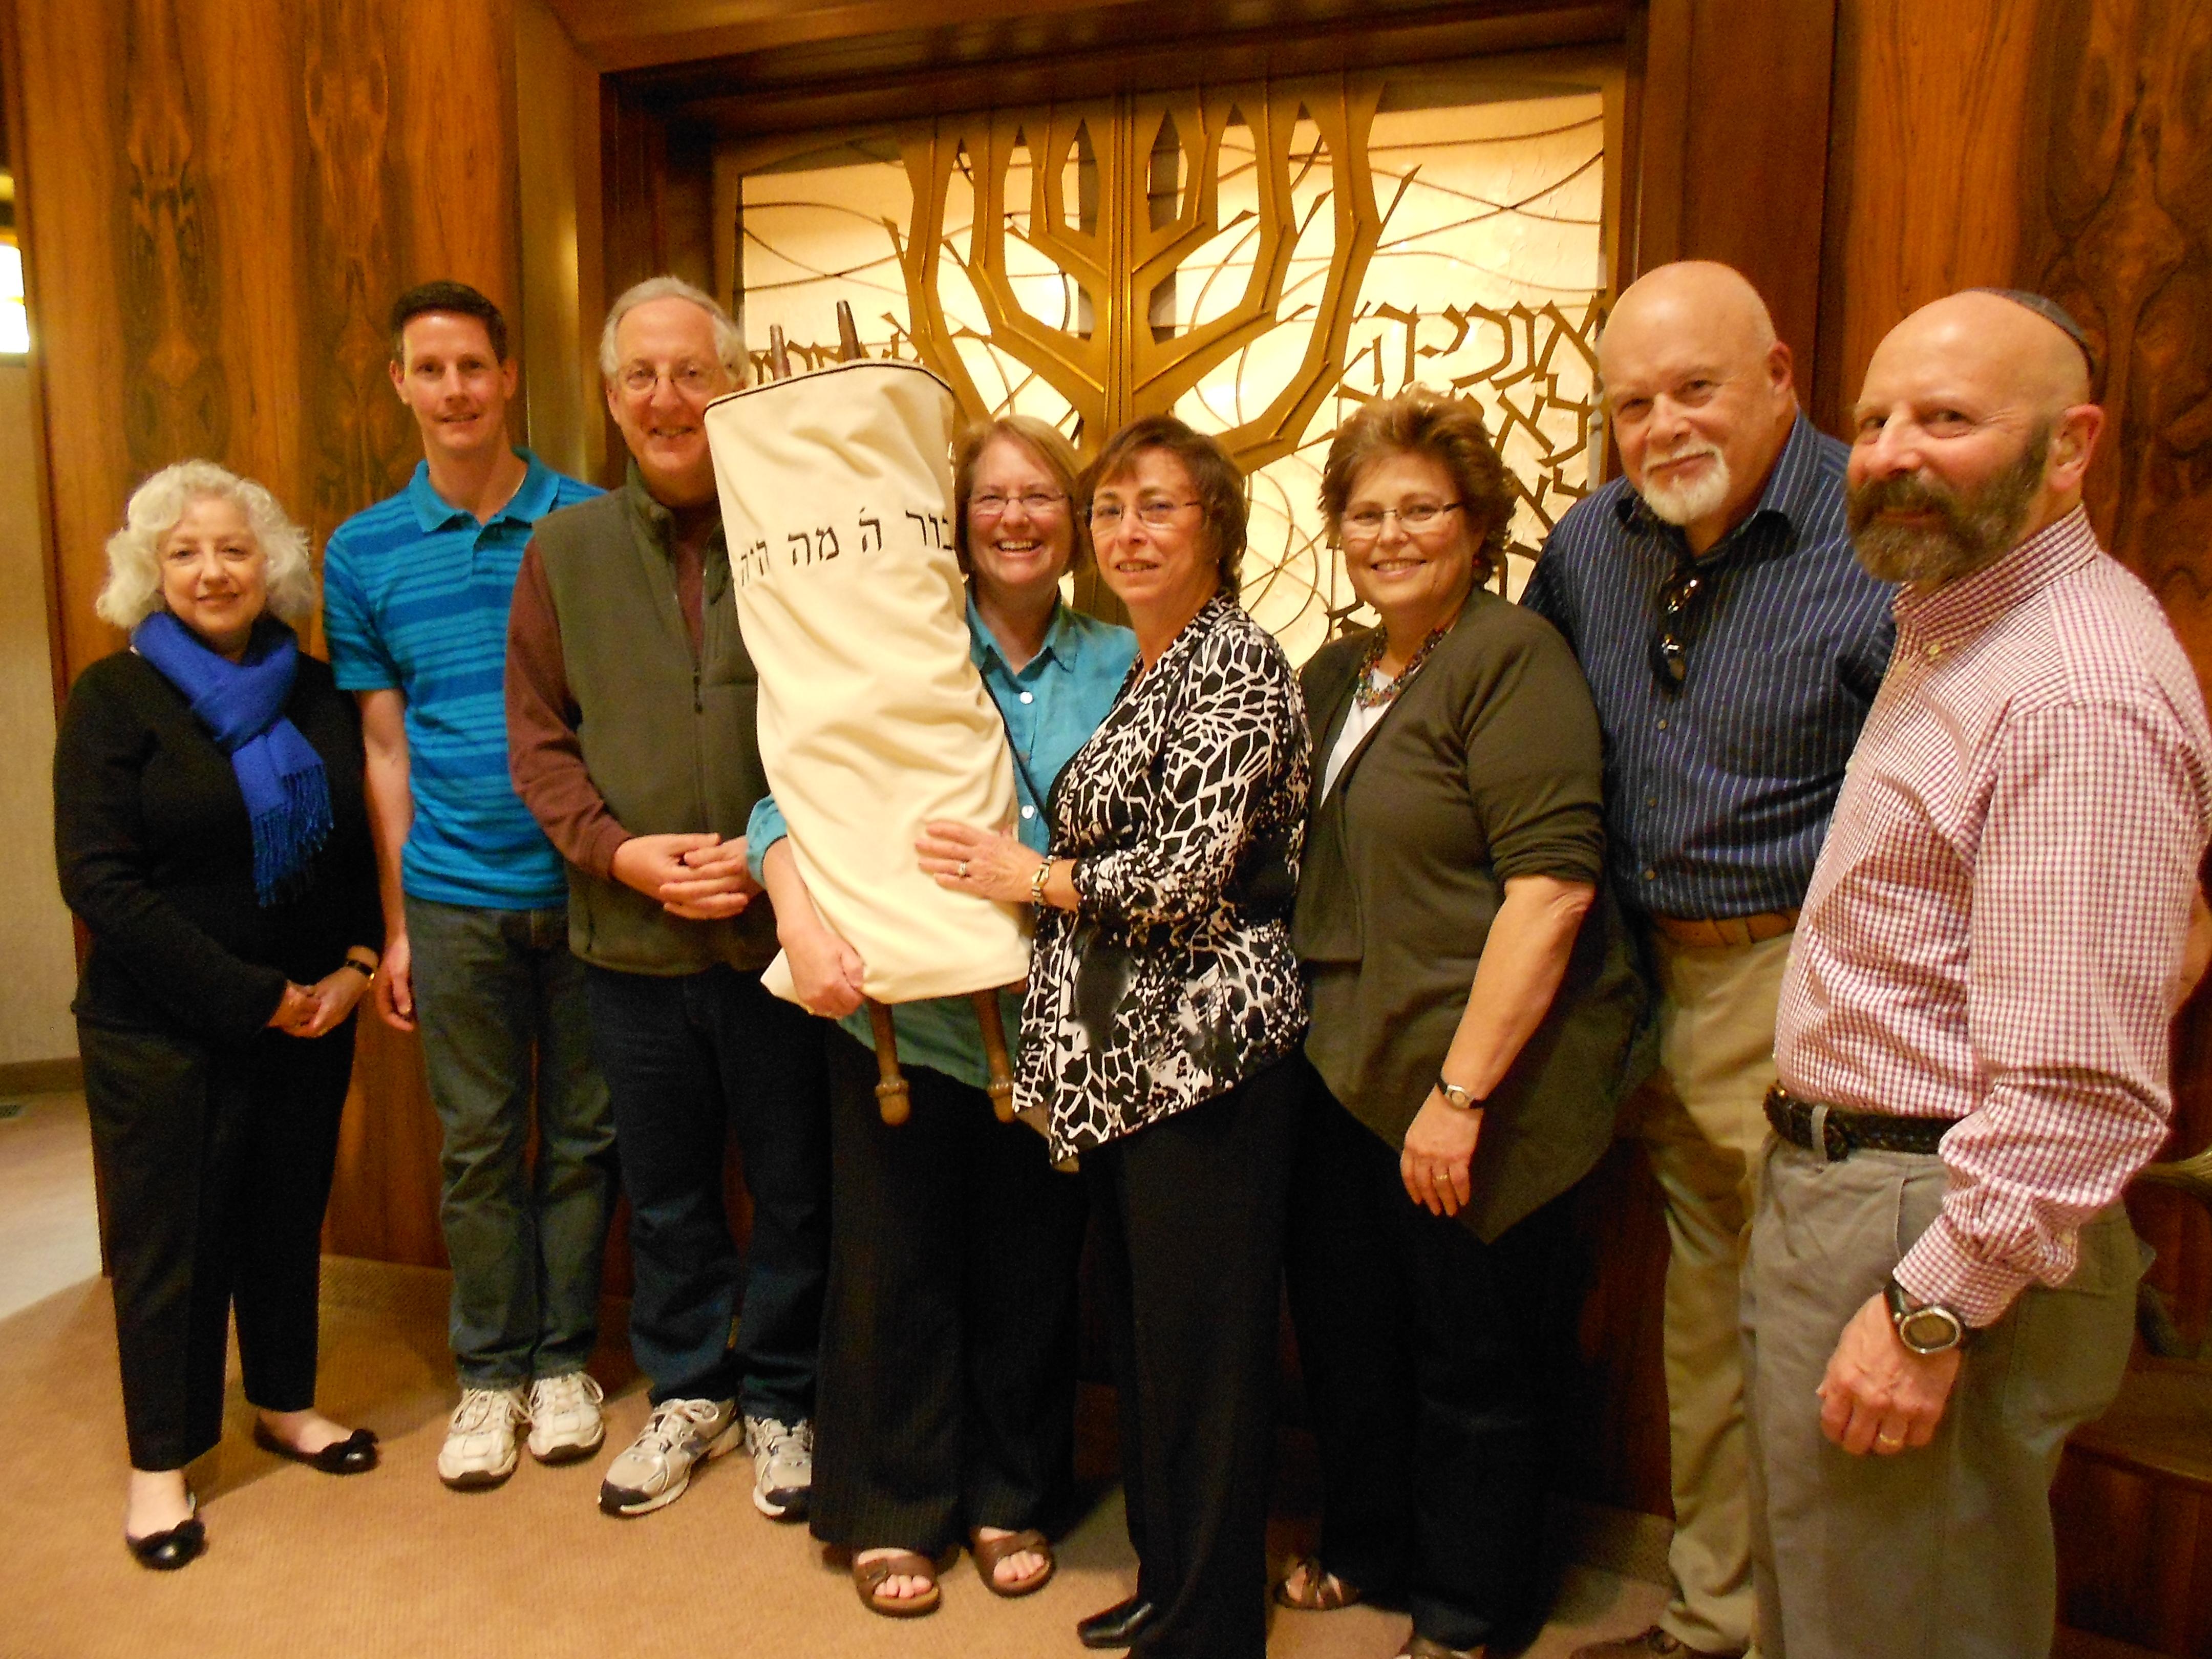 Shalom juutalainen dating